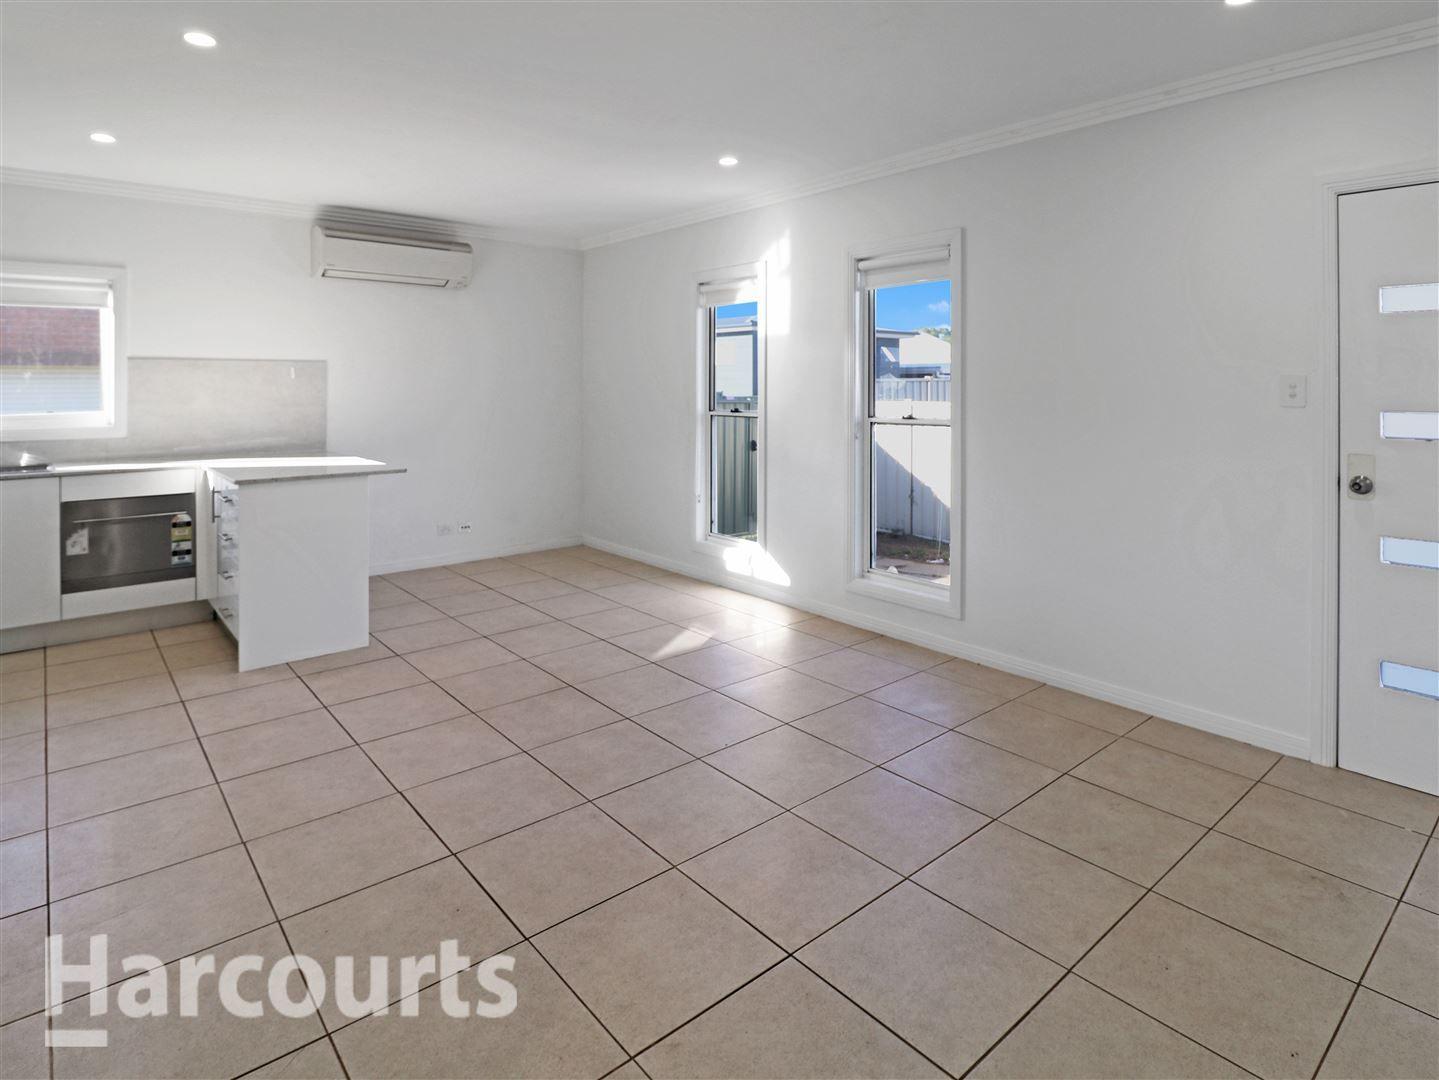 15a Birdwood Avenue (Leased by Harcourts), Umina Beach NSW 2257, Image 2